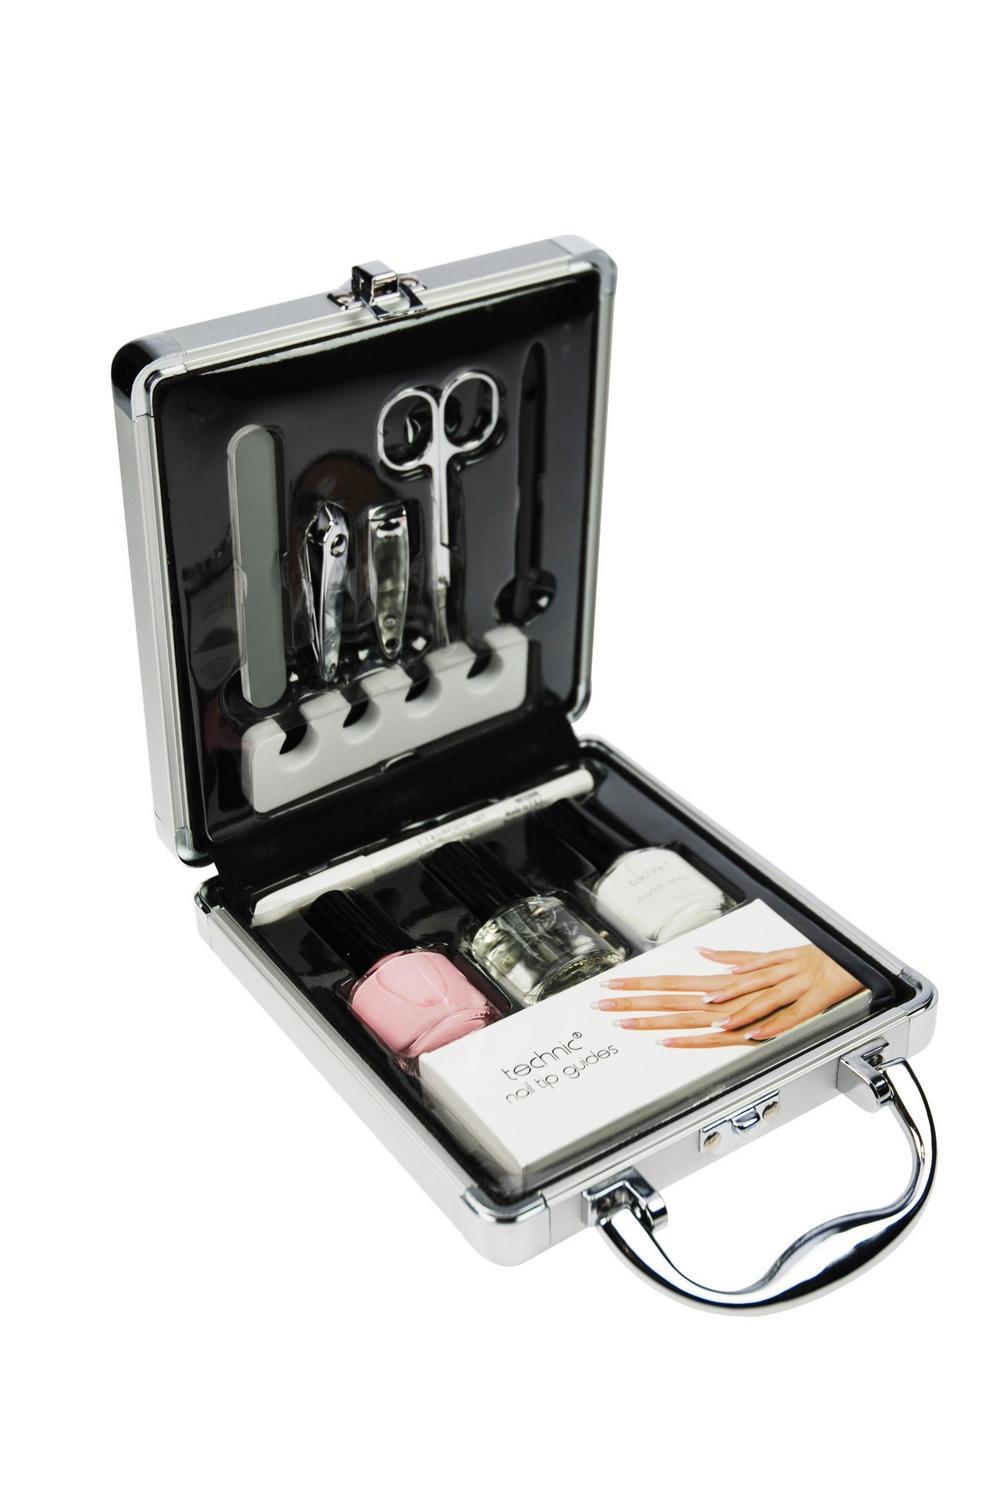 Technic Nail Varnish Small Beauty French Manicure Set Case